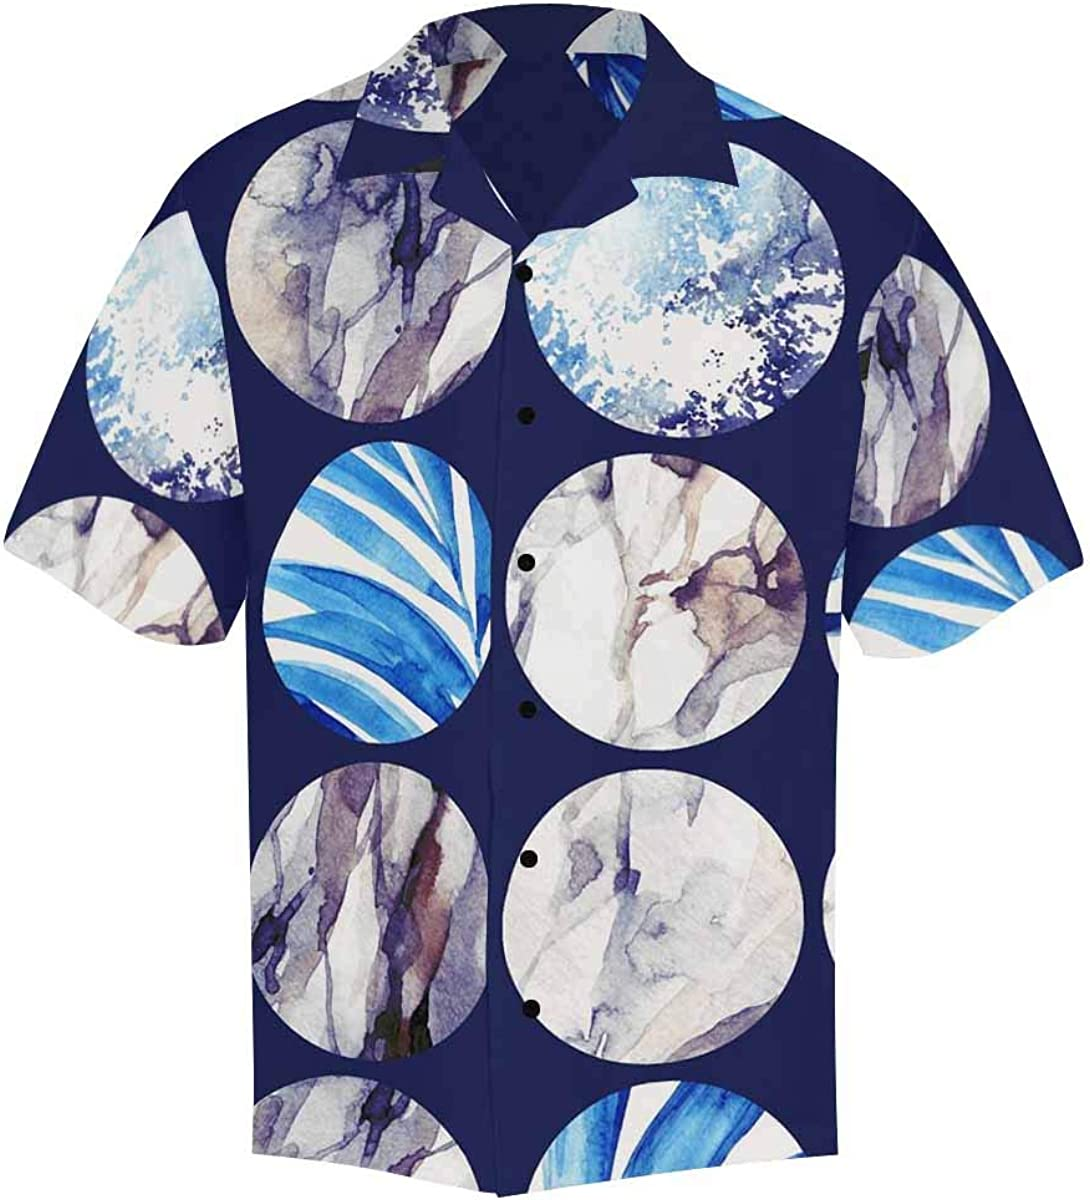 InterestPrint Men's Casual Button Down Short Sleeve Glittering Snowflakes Watercolor Circles Hawaiian Shirt (S-5XL)